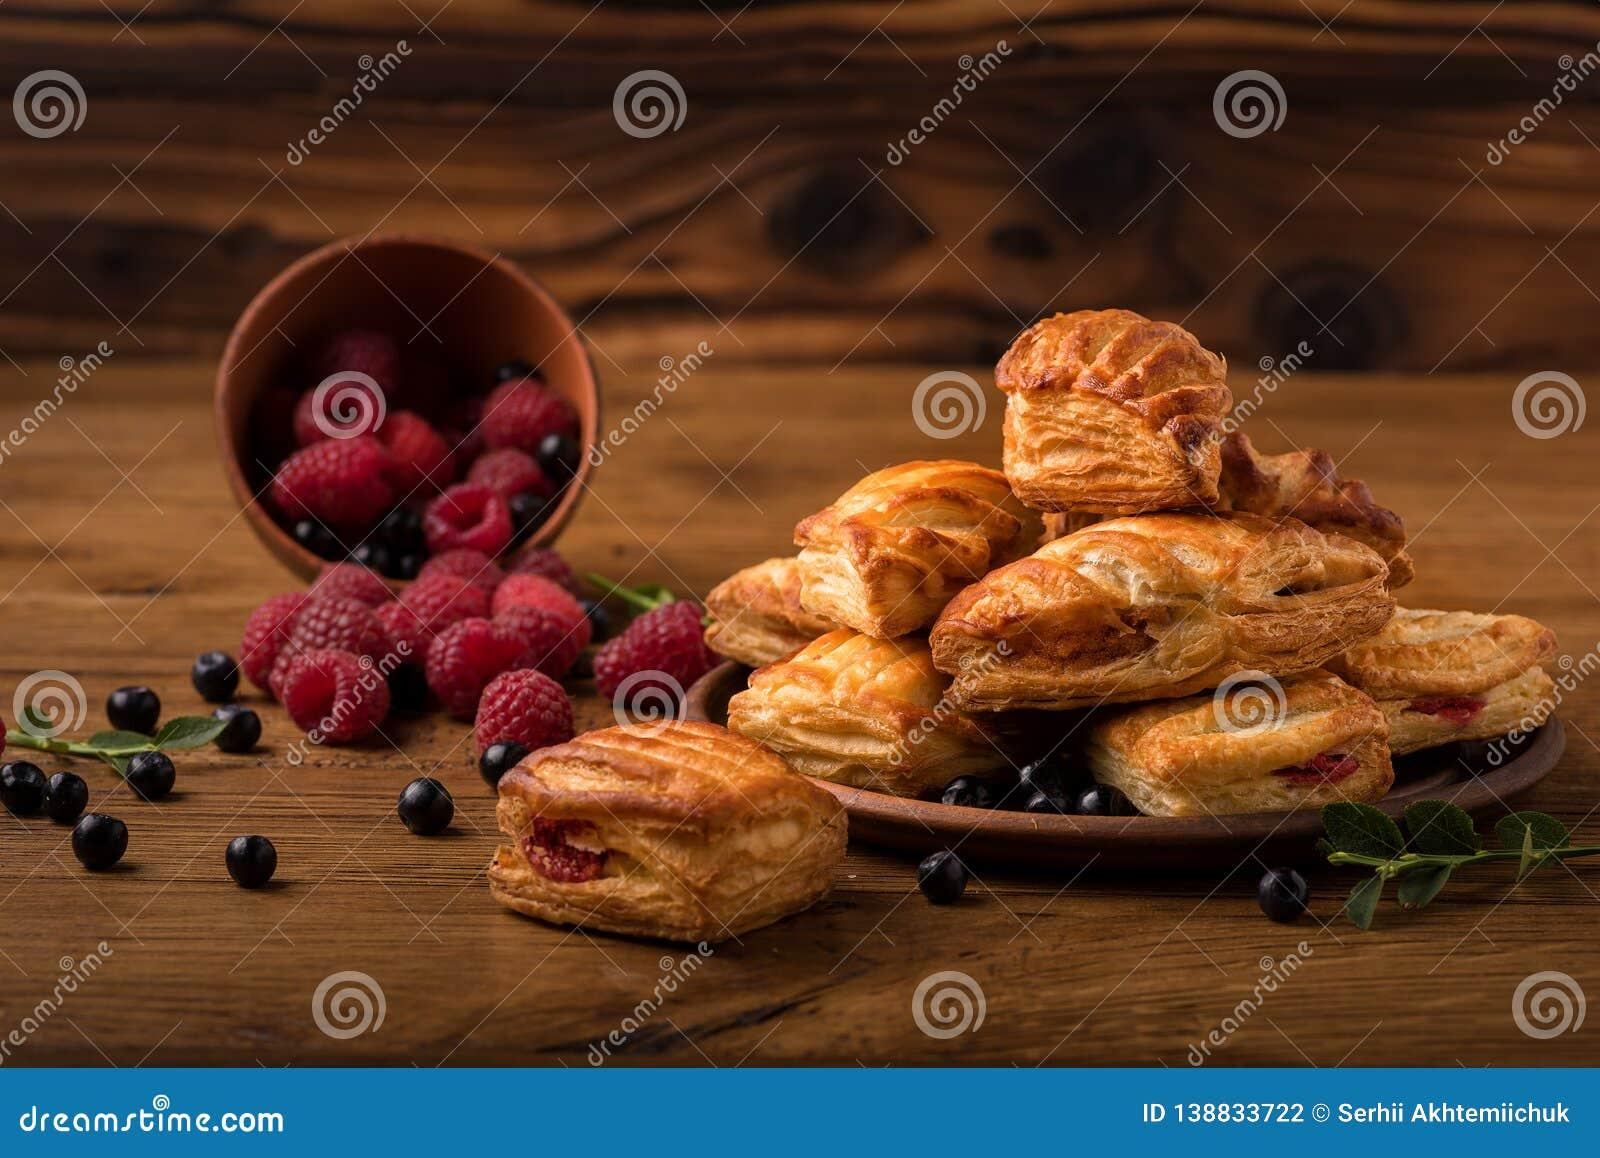 Fresh tasty pastries with raspberry jam